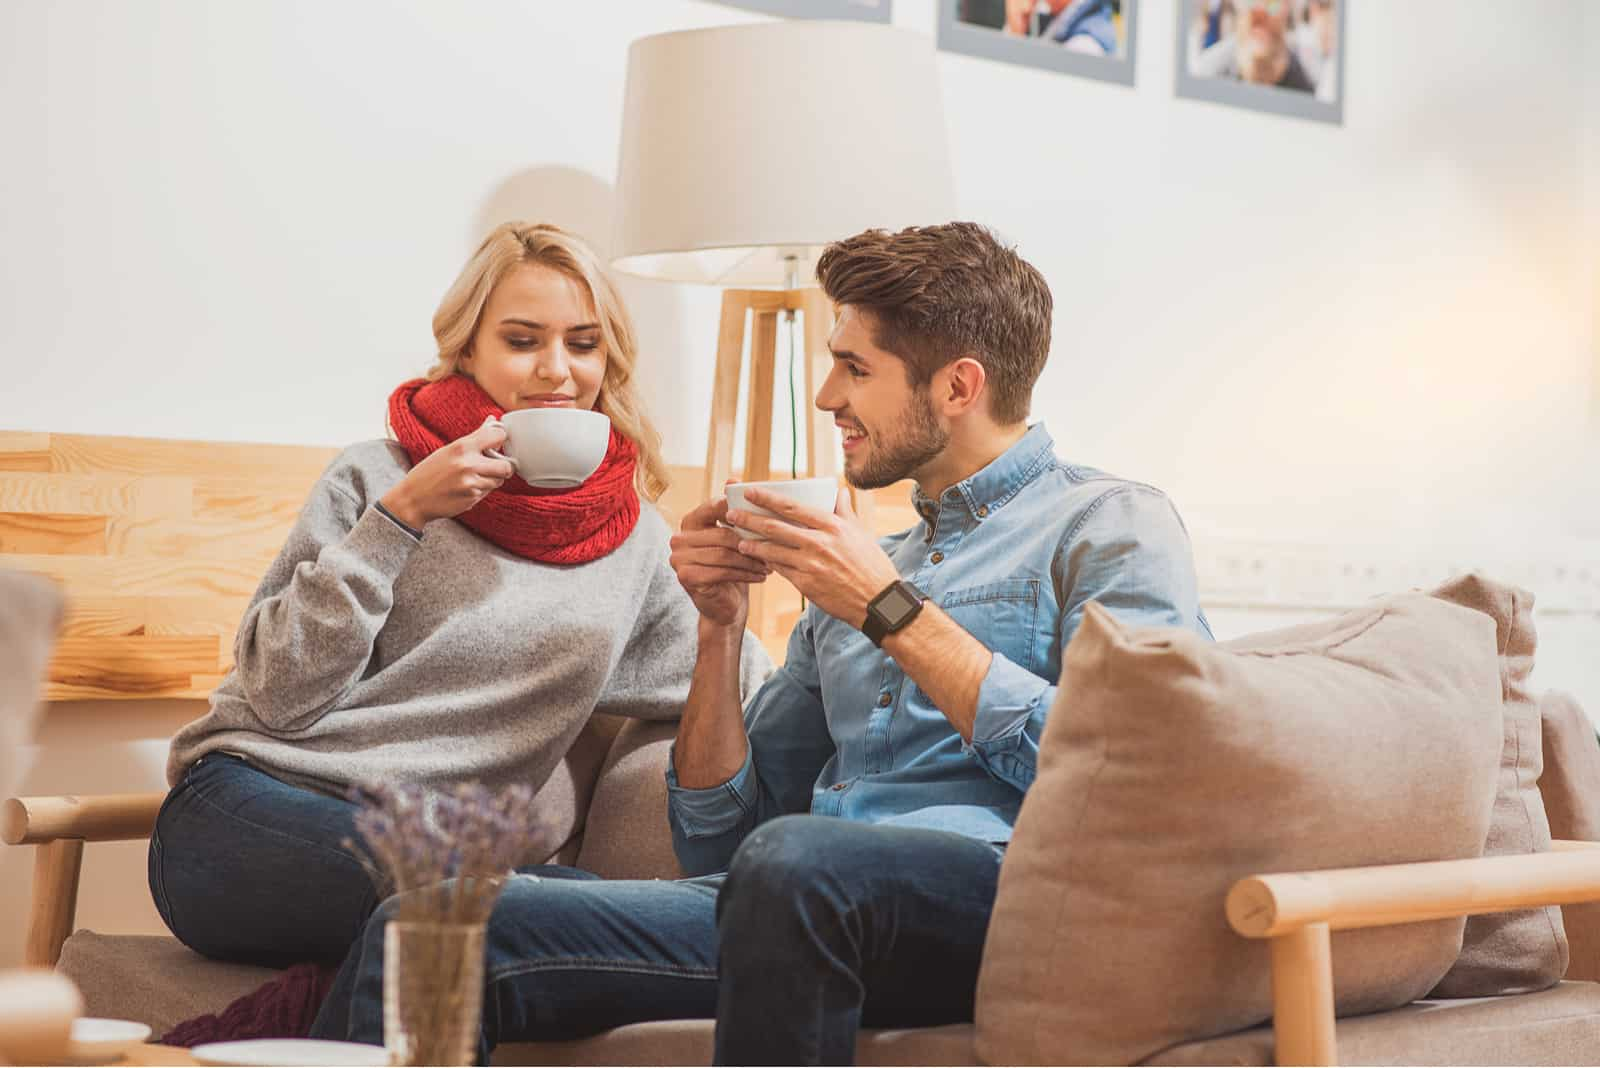 Happy man and woman enjoying hot drink